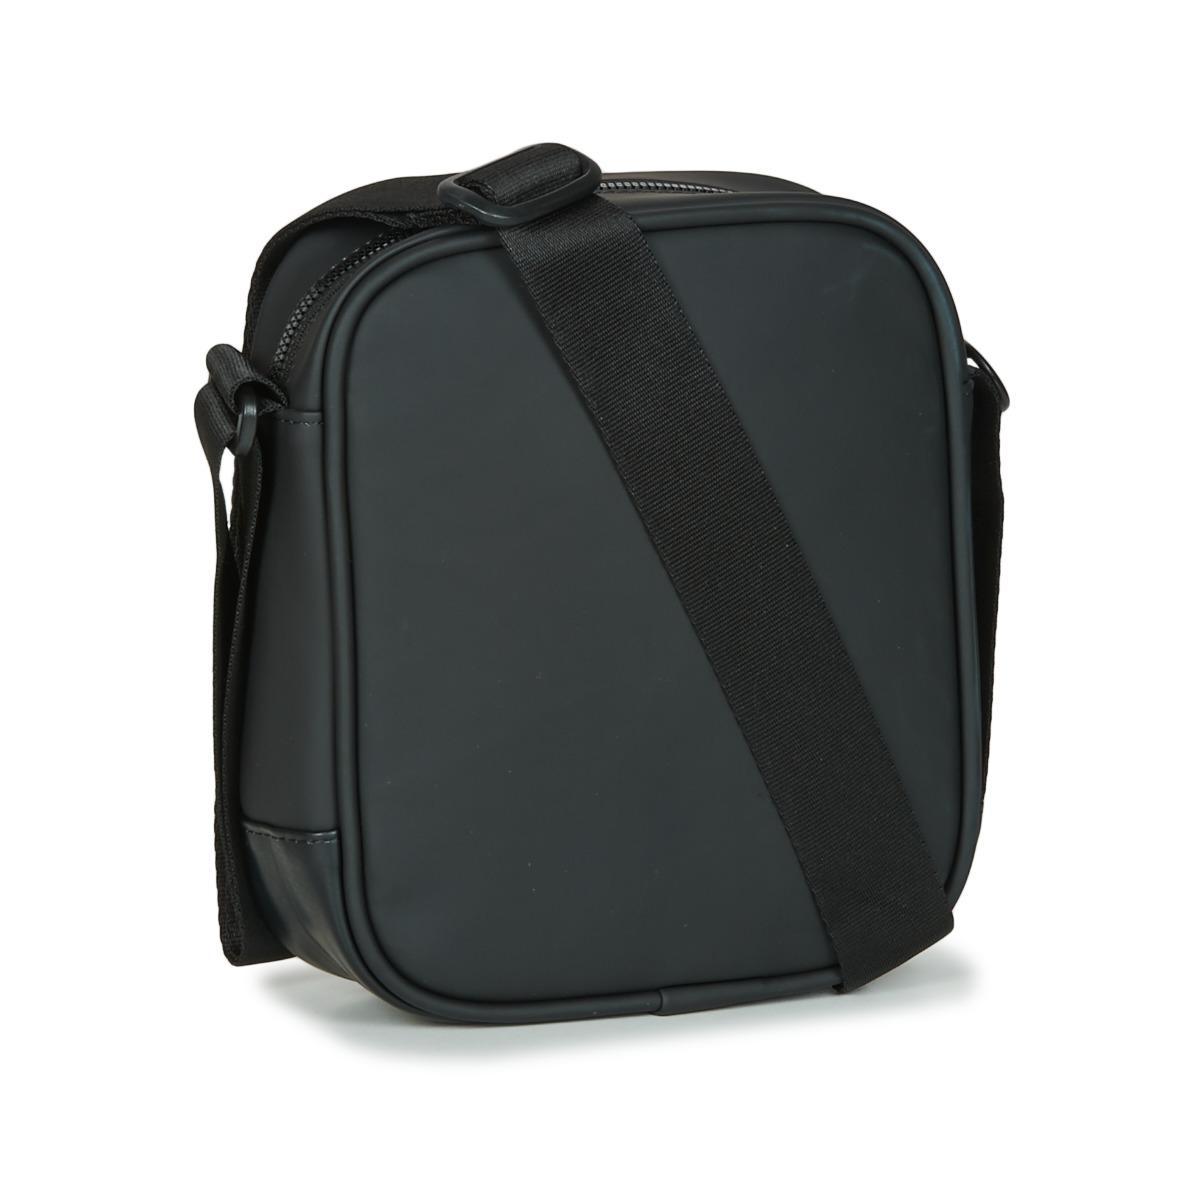 268ae0fffc37 PUMA - Originals Portable Men s Pouch In Black for Men - Lyst. View  fullscreen